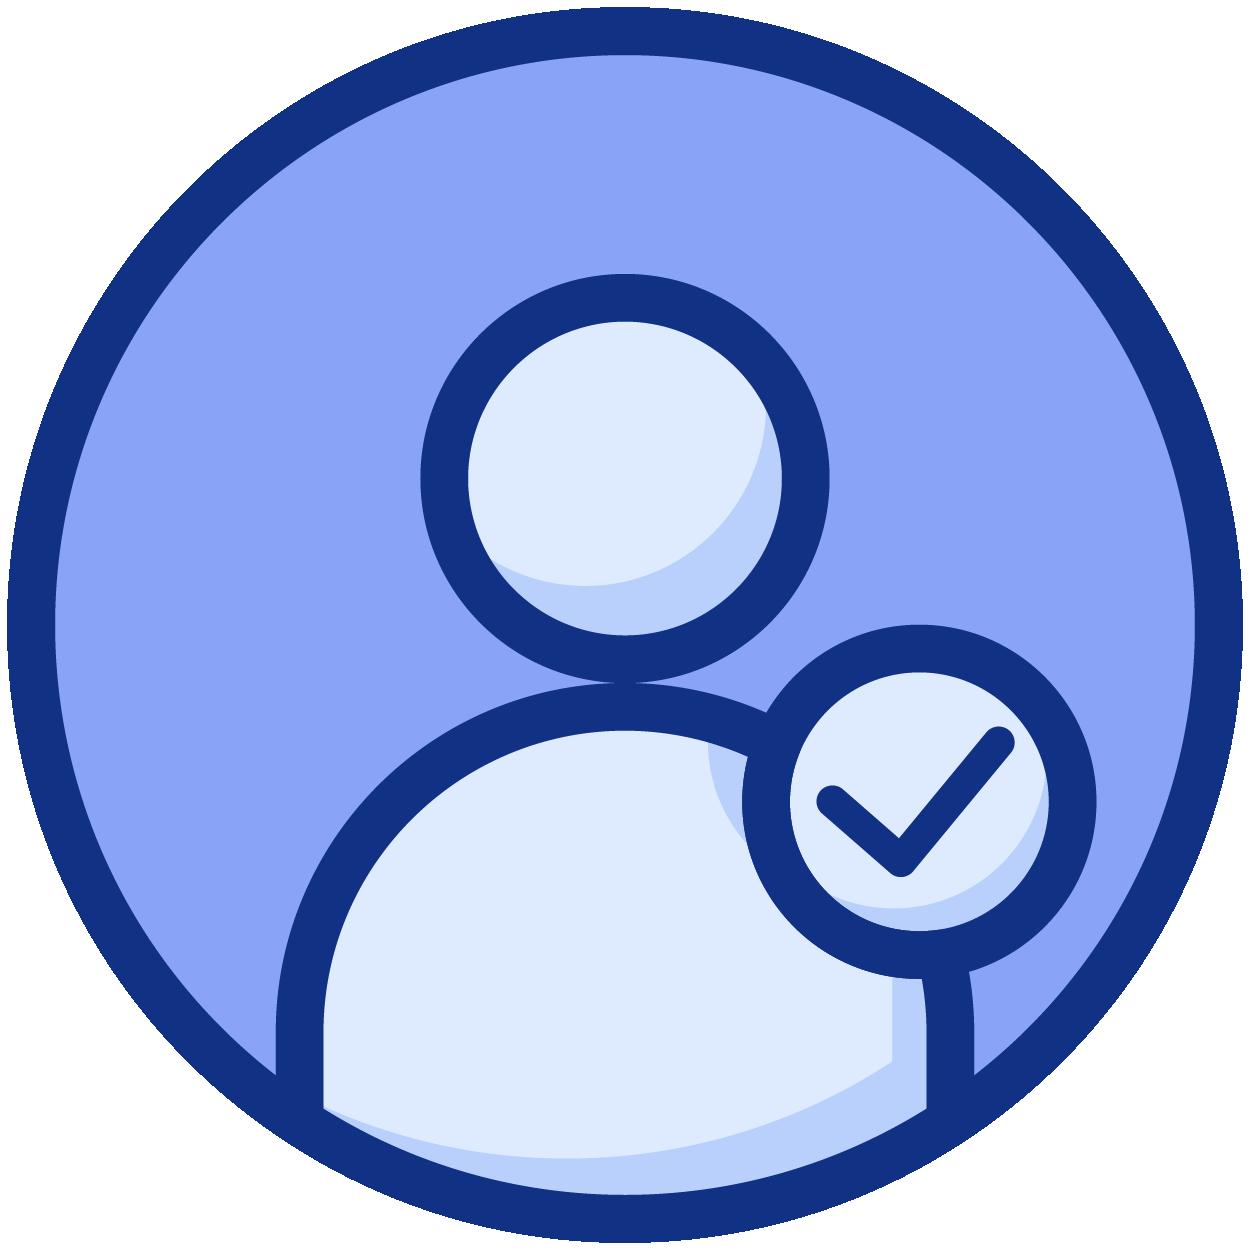 identity verification icon